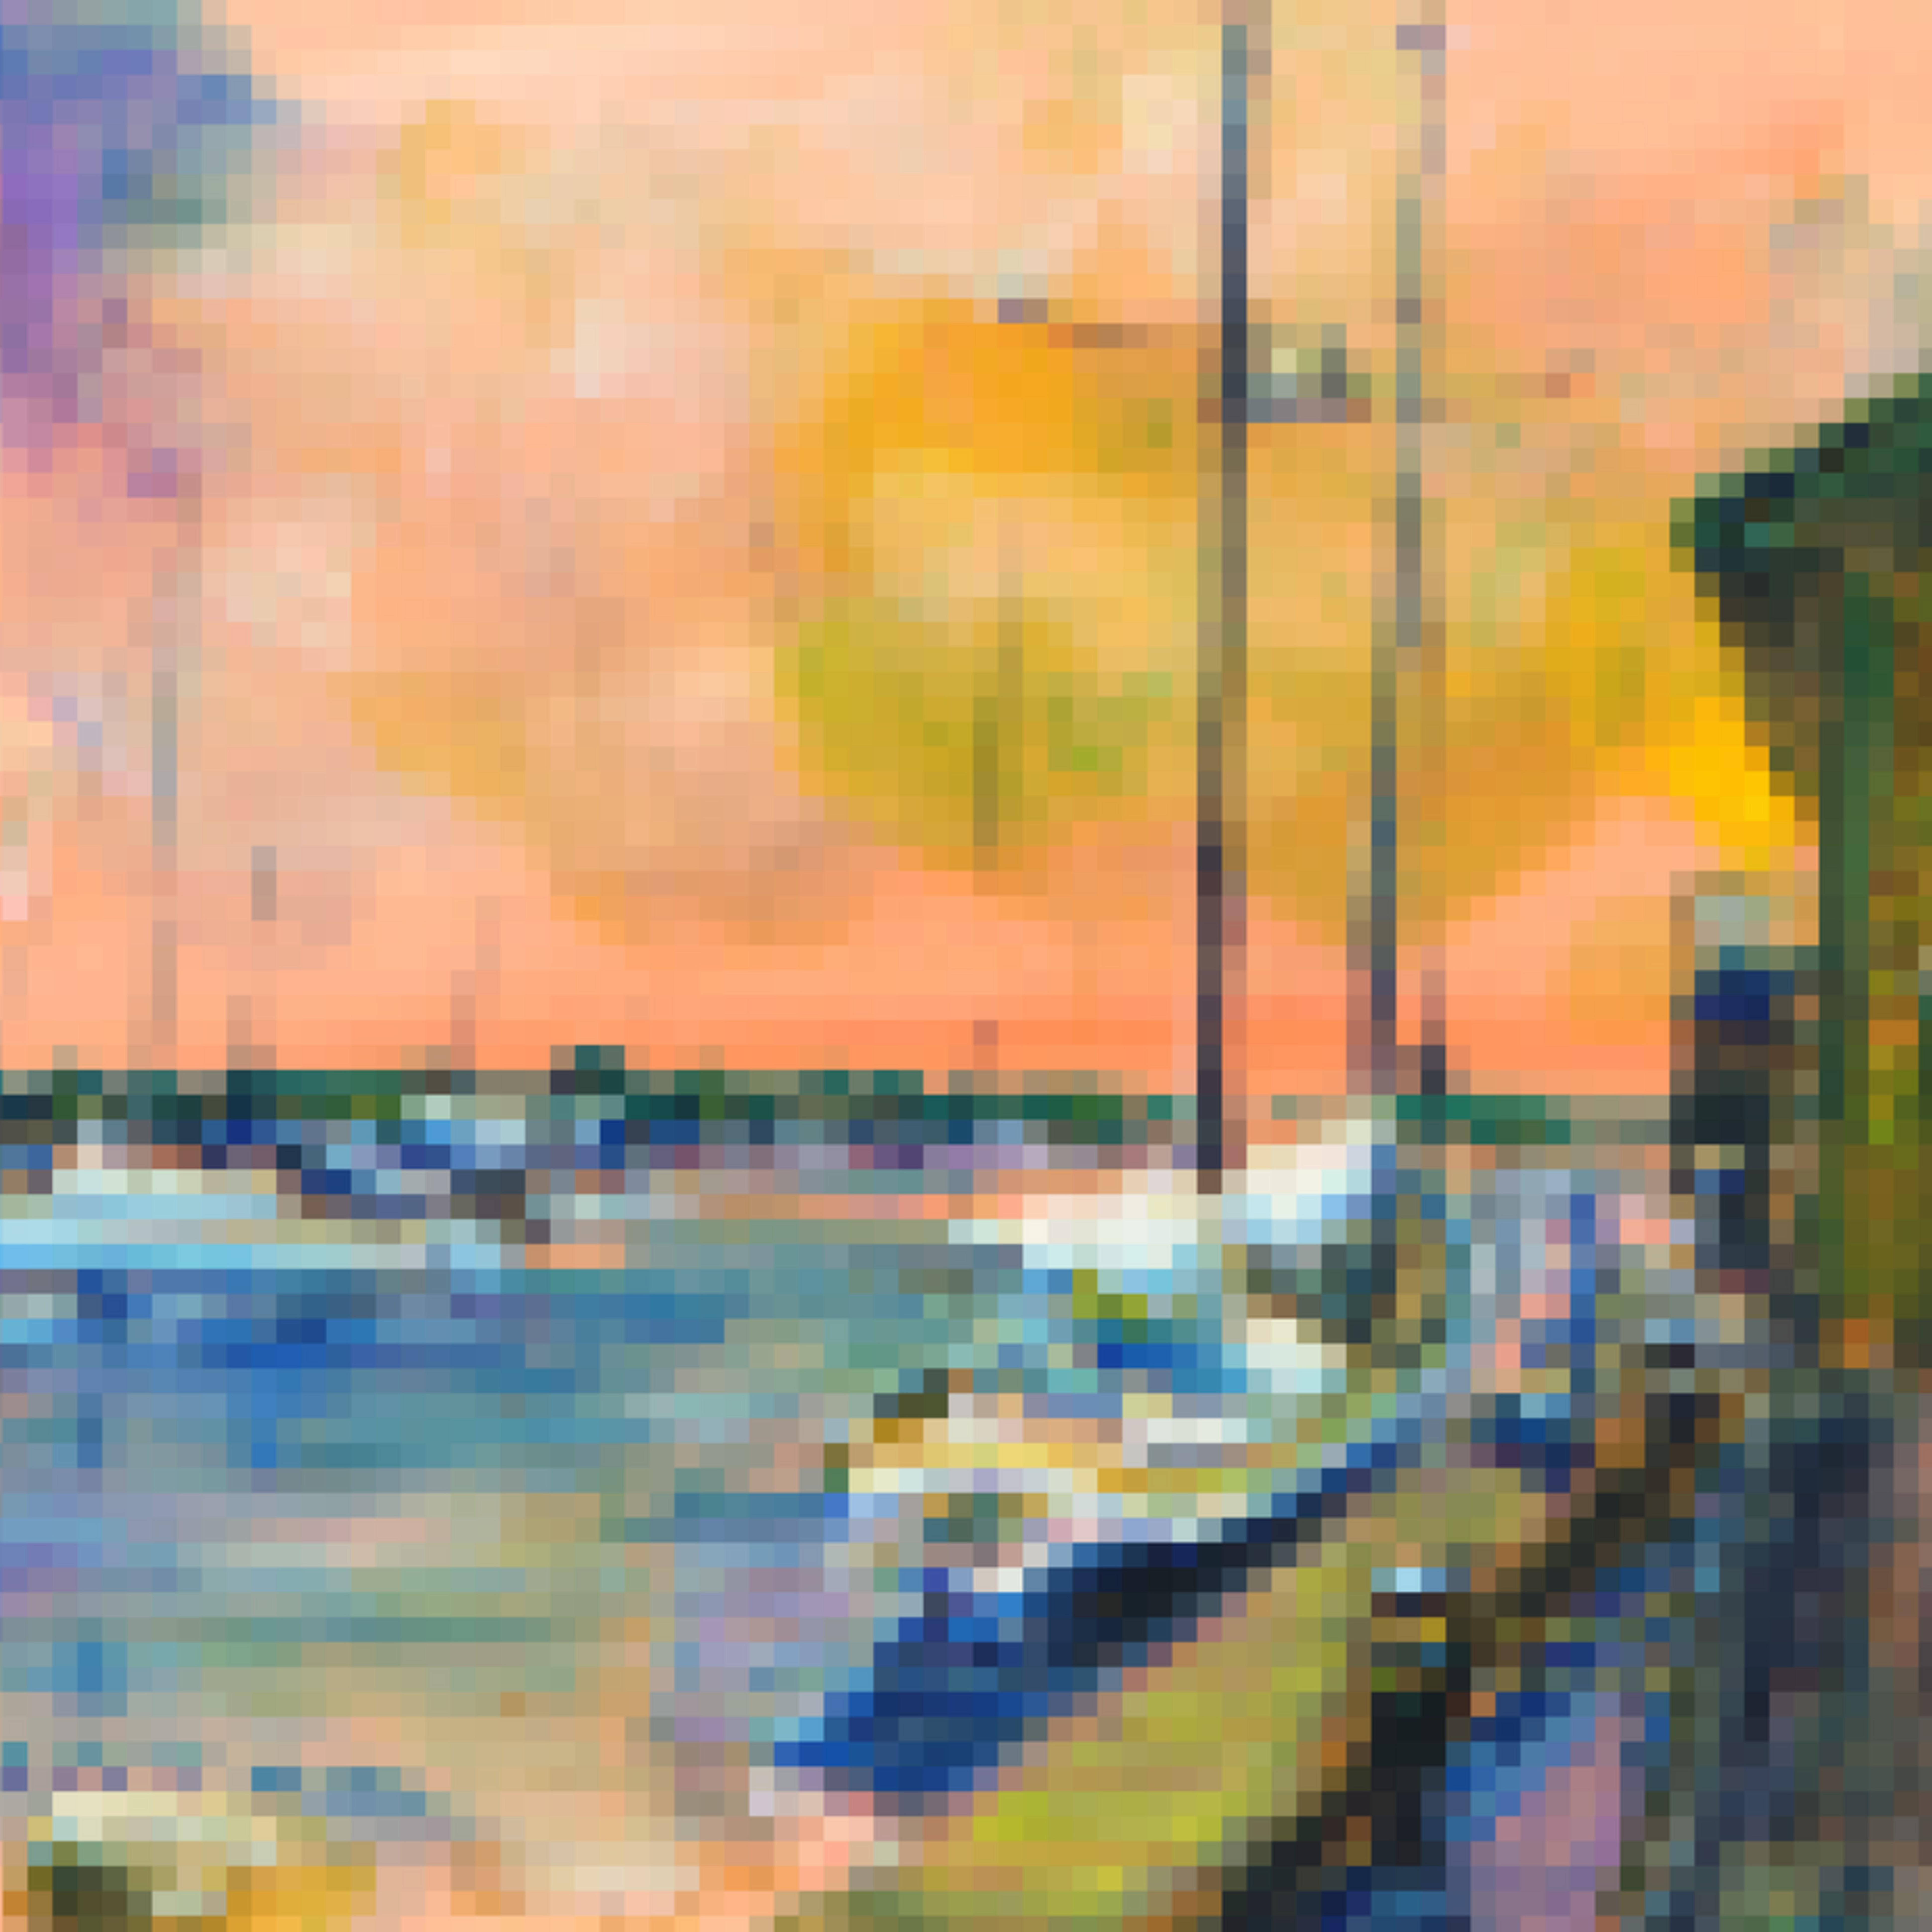 Bowenswharf 1600 pixel100 uejdbr